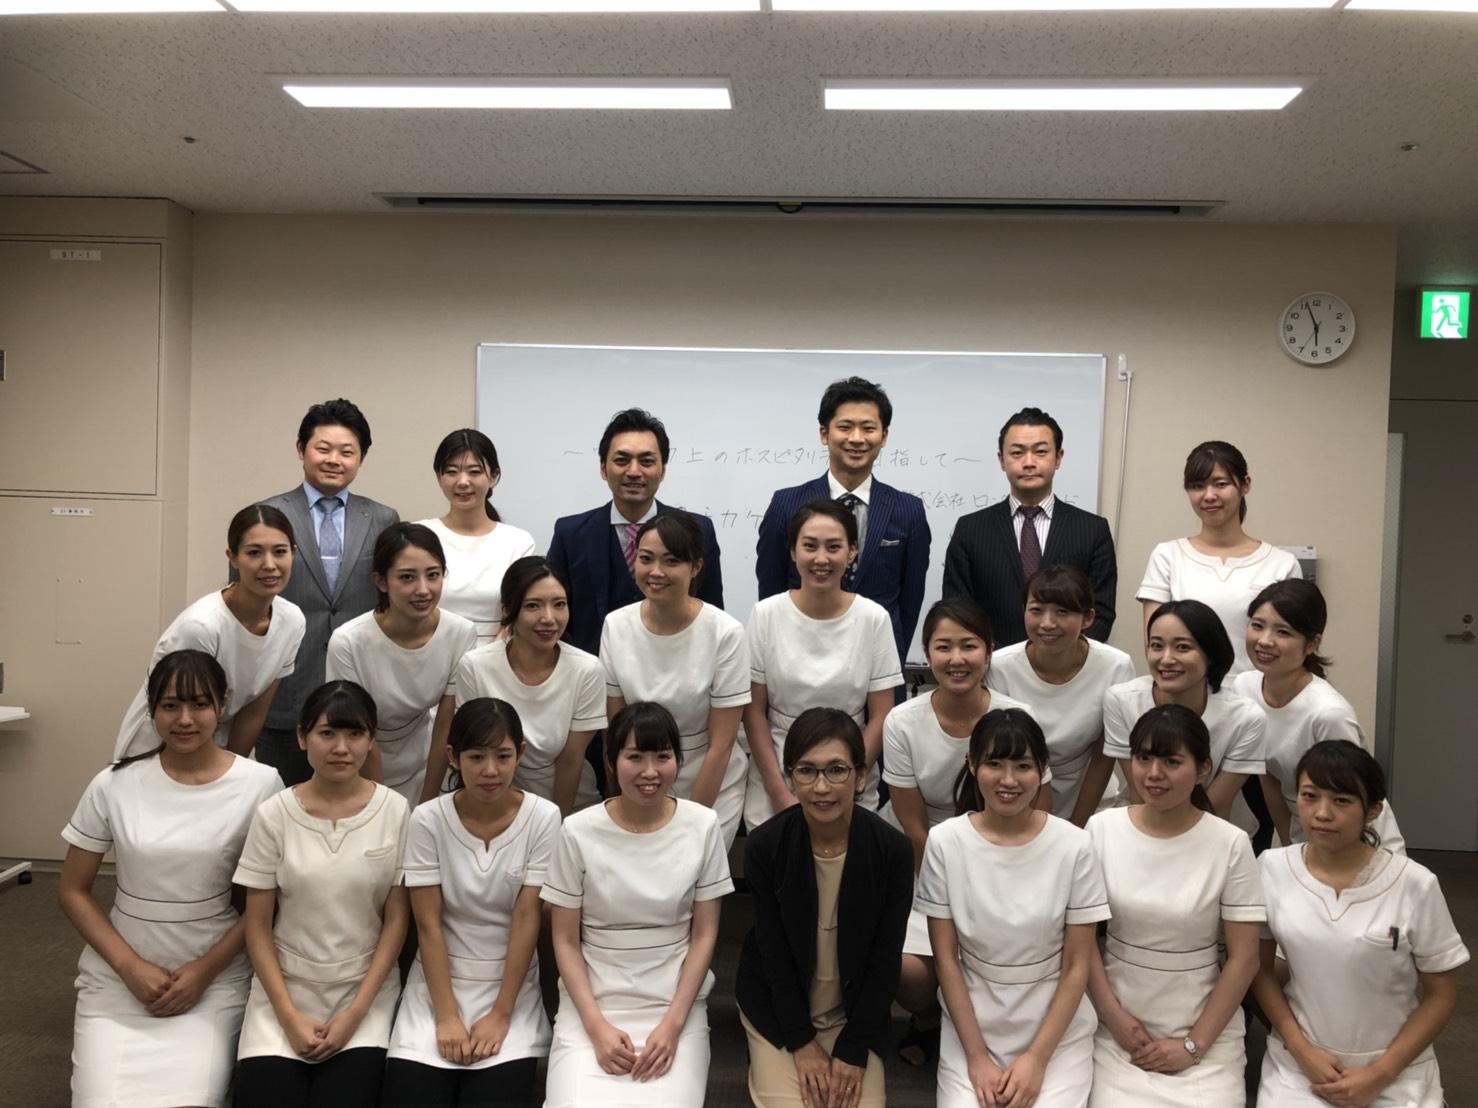 http://www.s-shika-clinic.com/asset/image1%20%2822%29.JPG